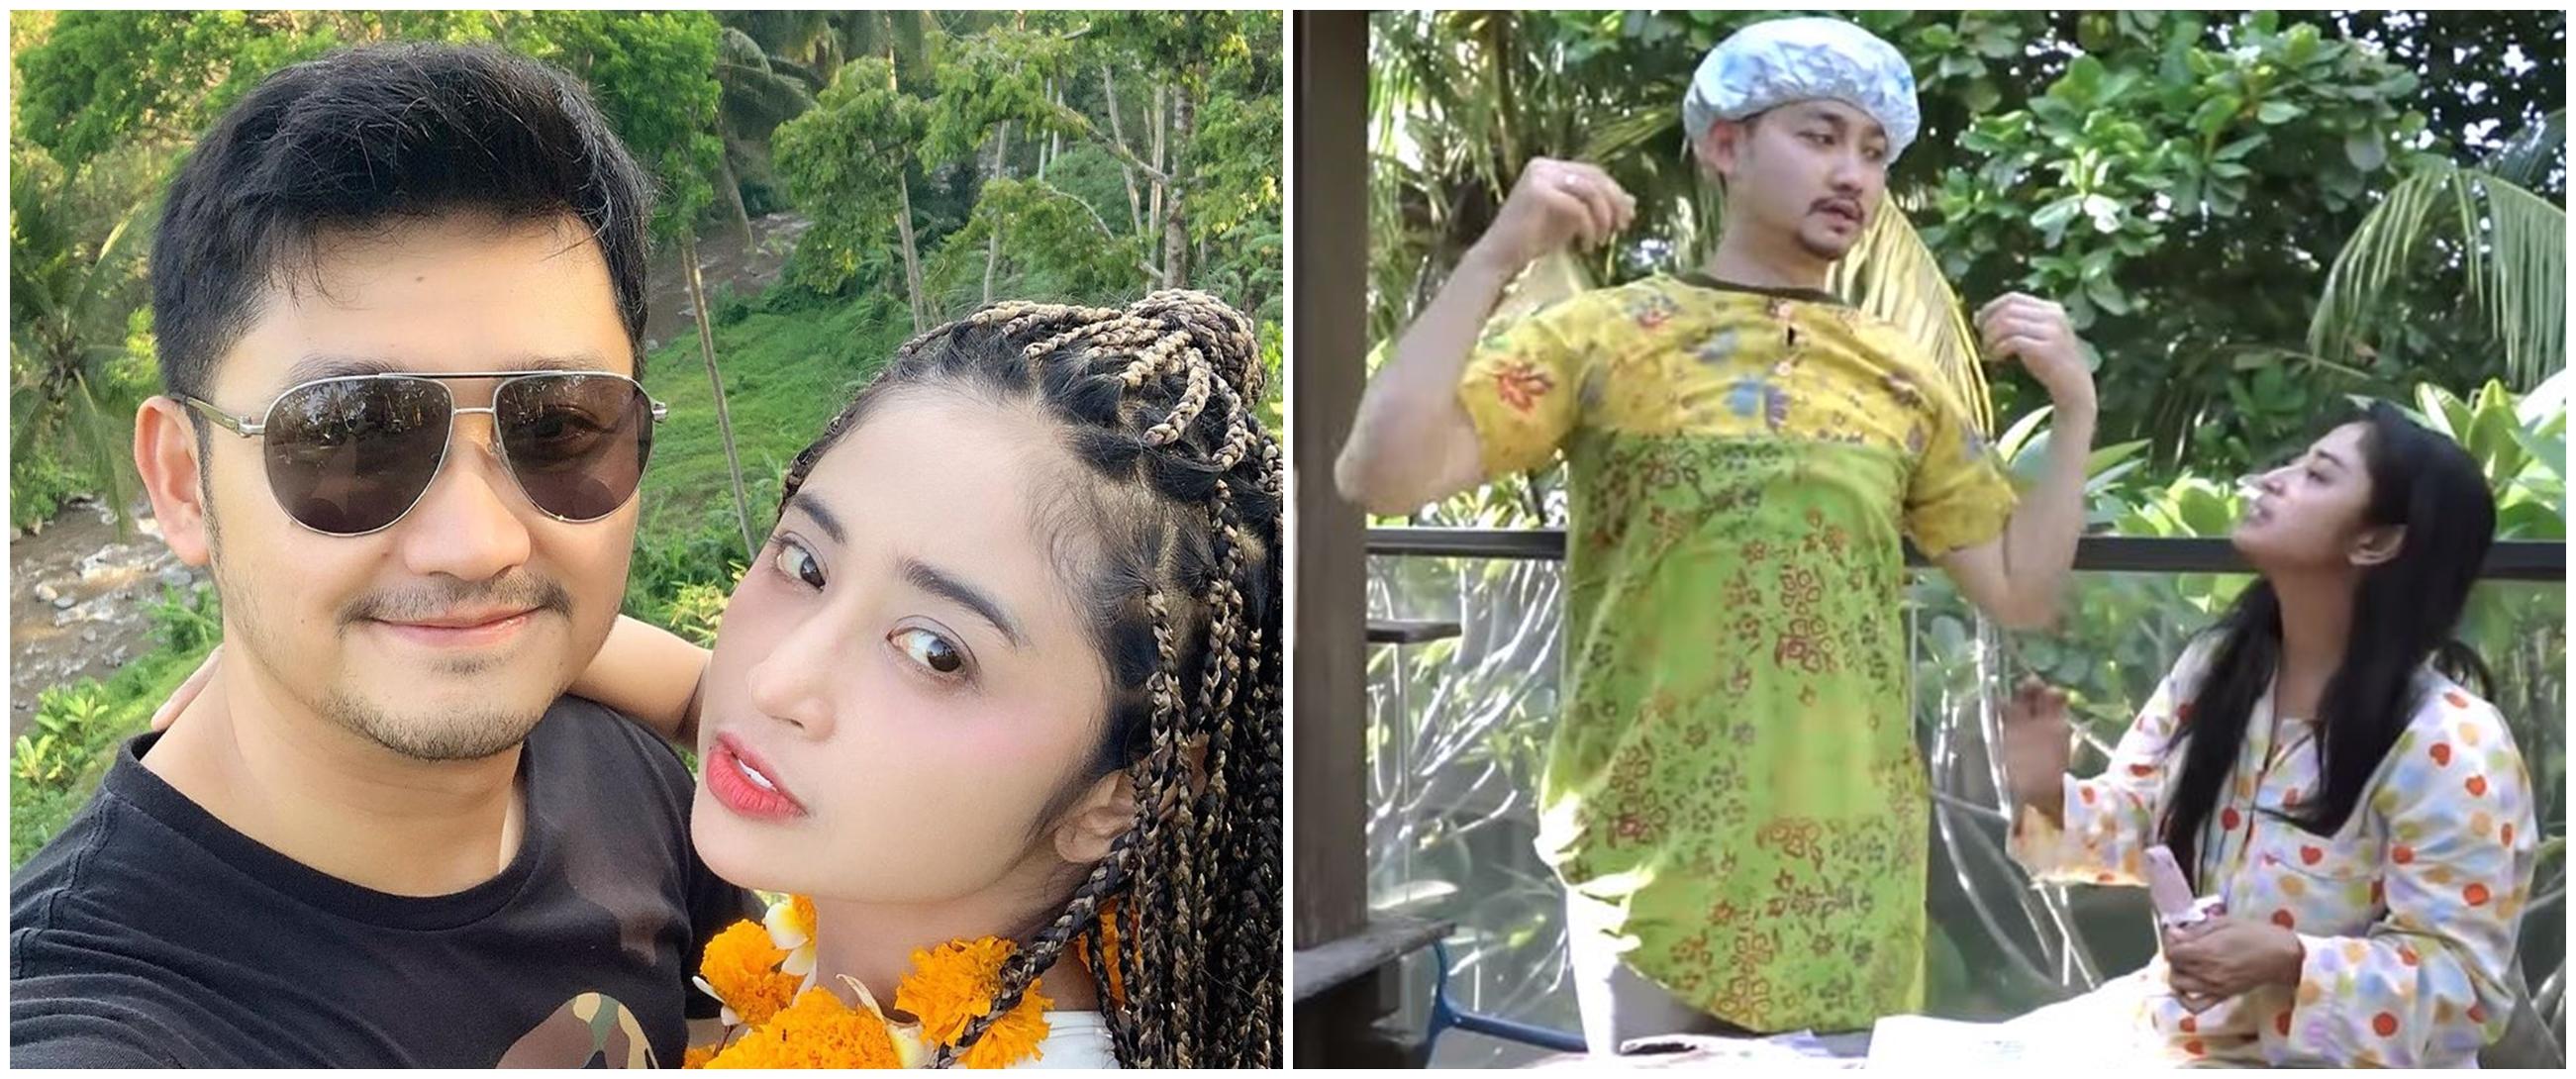 10 Momen lucu Angga Wijaya pakai daster, di-prank Dewi Perssik